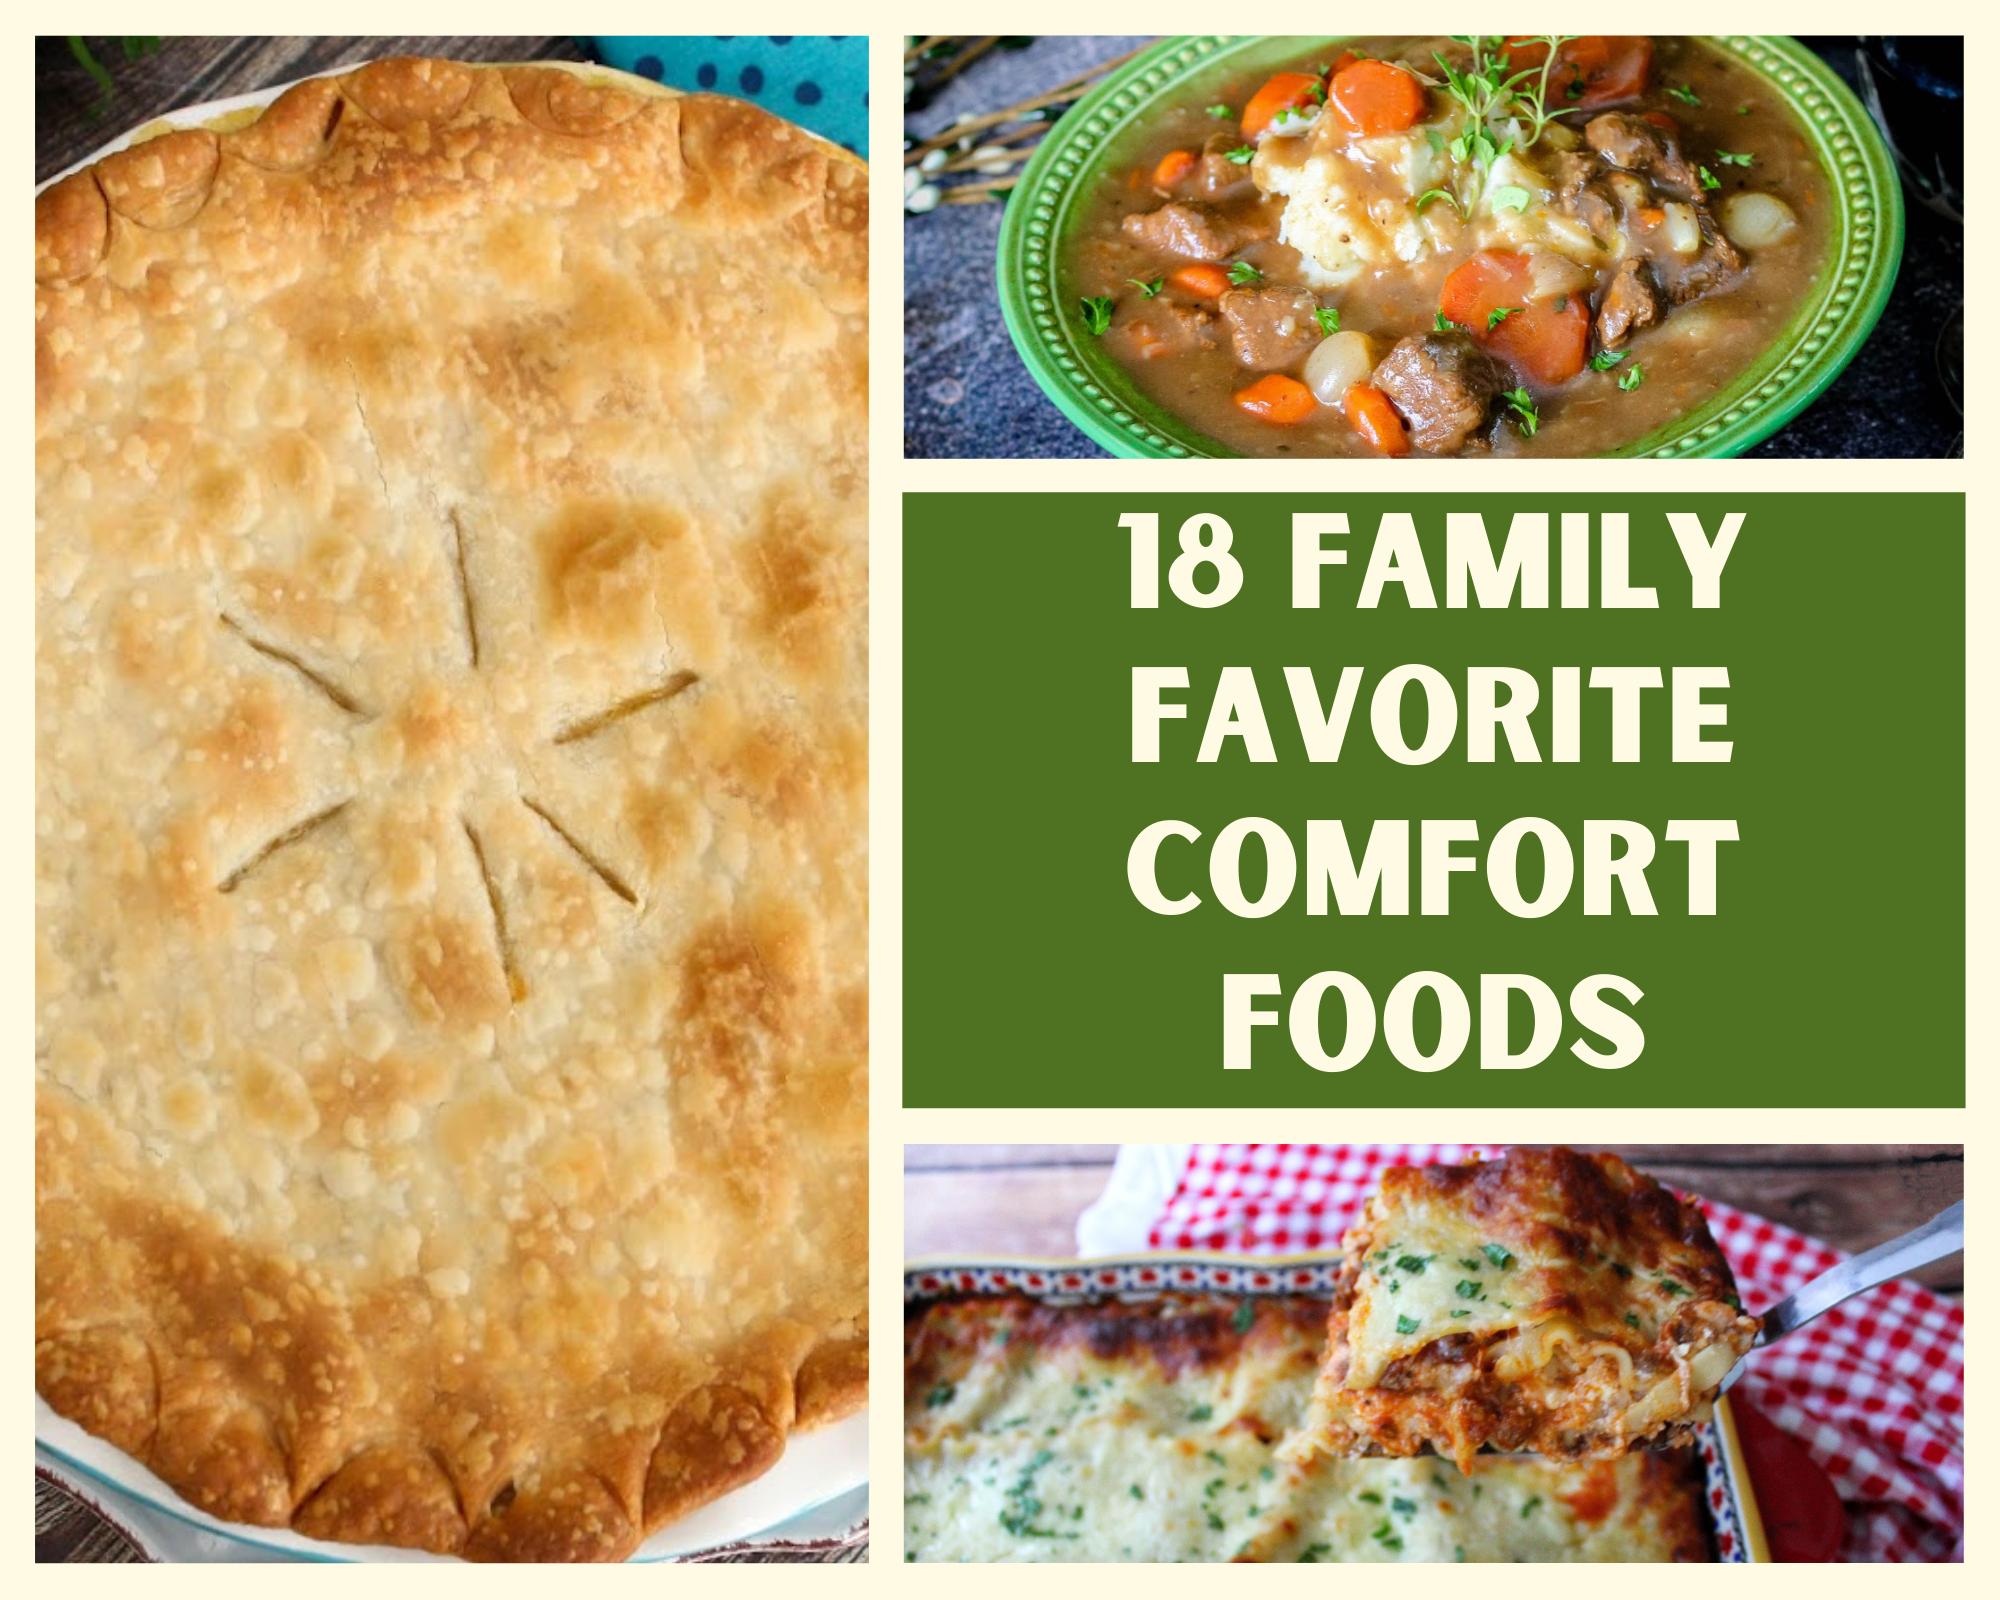 family favorite comfort foods